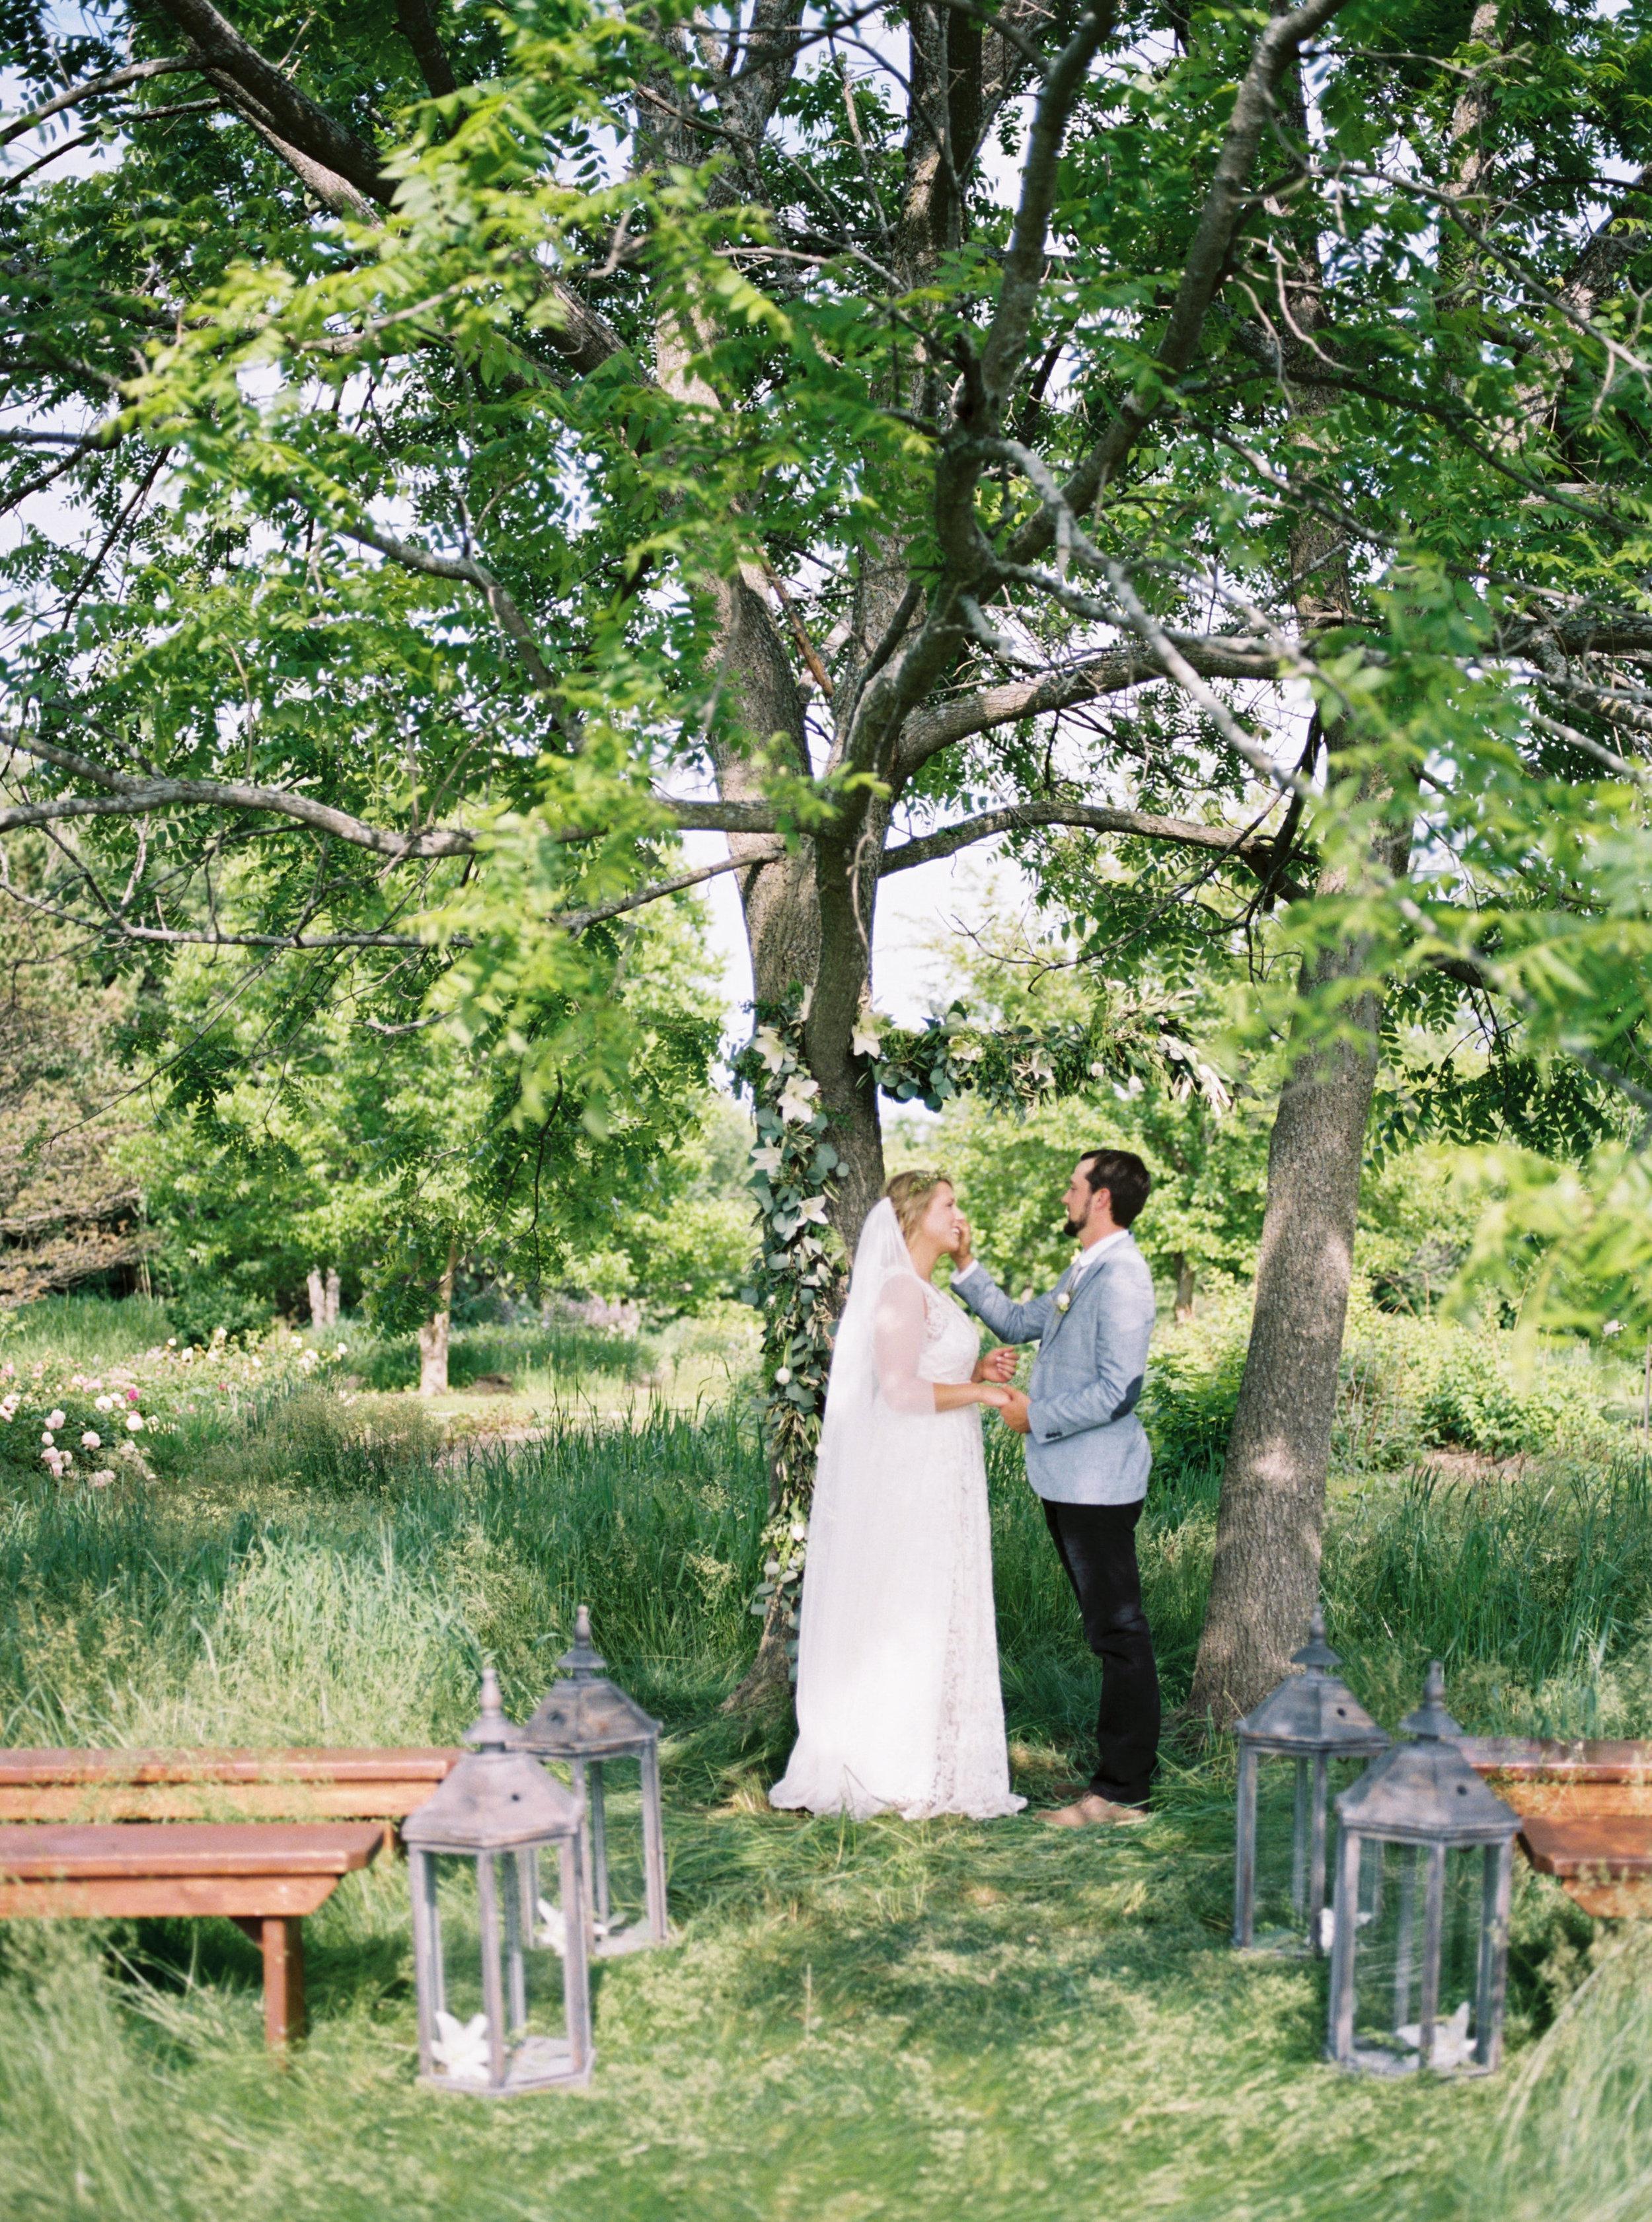 greenhouse-wedding-inspiration-by-laurelyn-savannah-photography-110.jpg